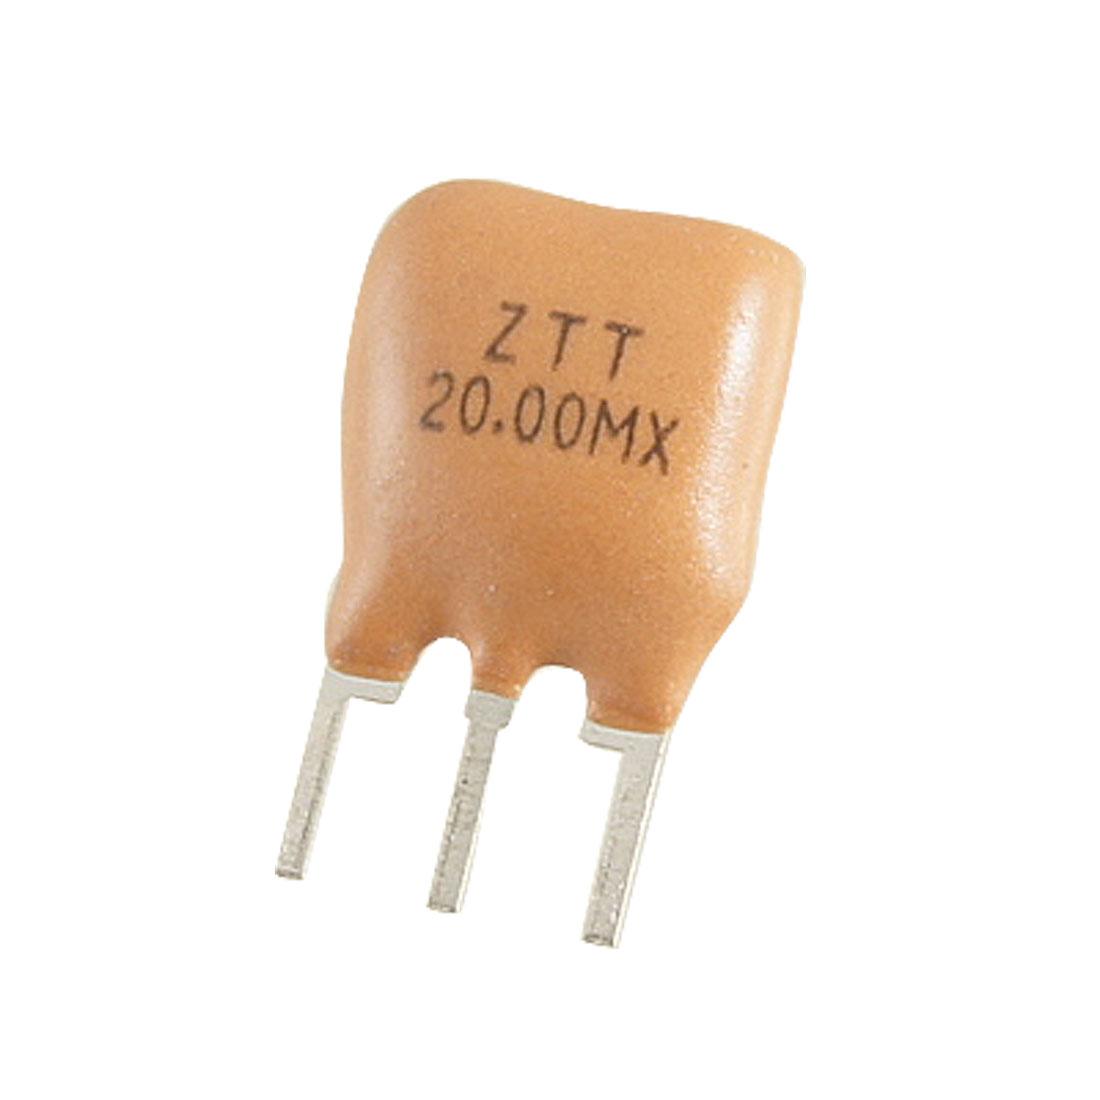 5 x Radial Lead 20.000 MHz Ceramic Resonator 3 Pins ZTT Series